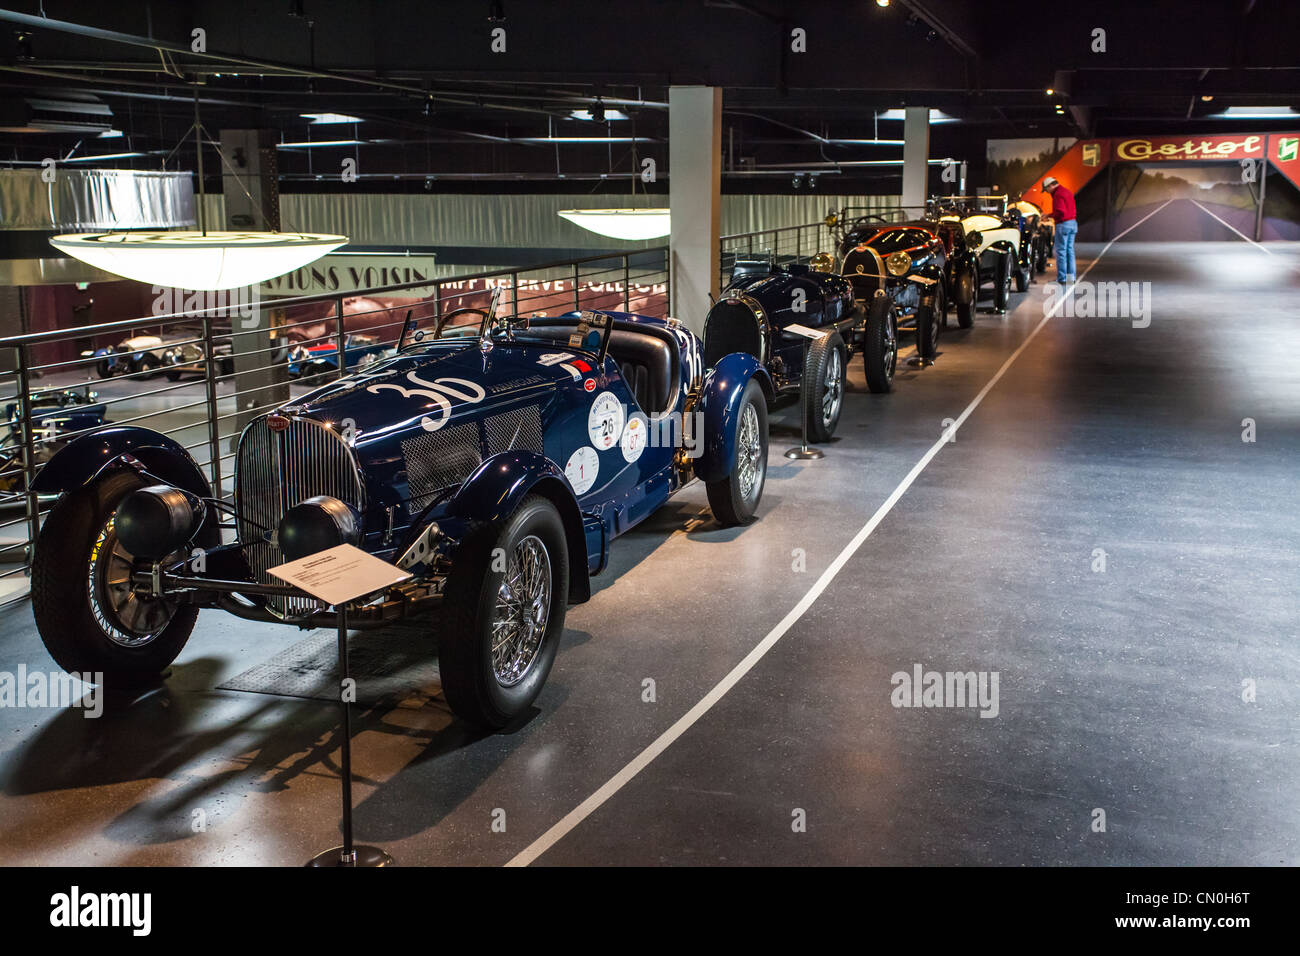 A Line Of Race Cars At The Mullin Museum In Oxnard California Stock - Oxnard car show